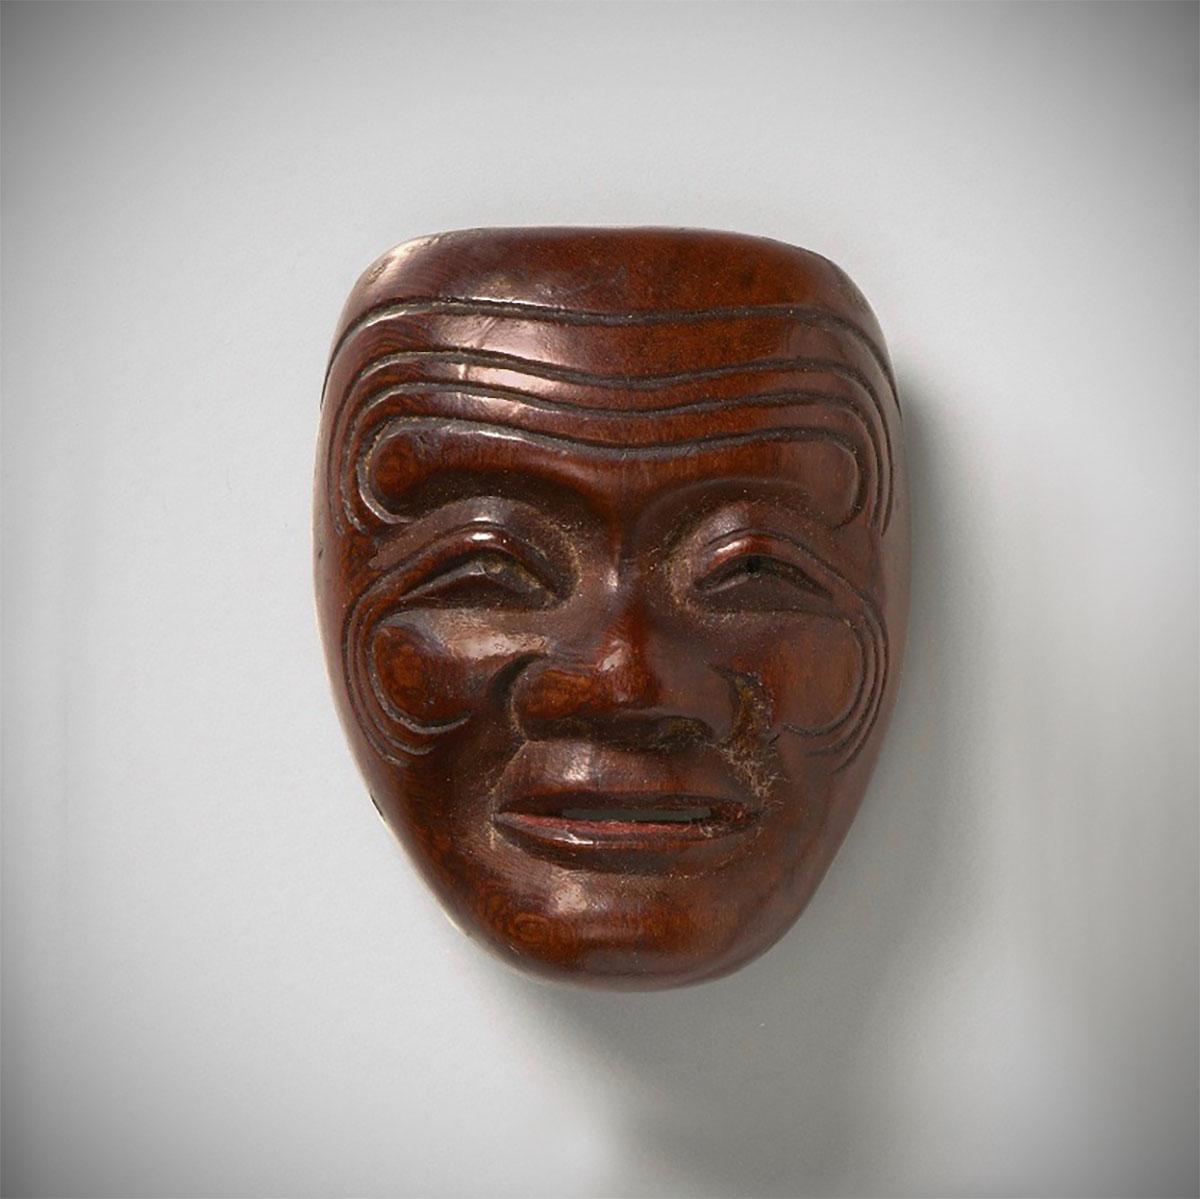 A male mask by Deme Joman_2417-2